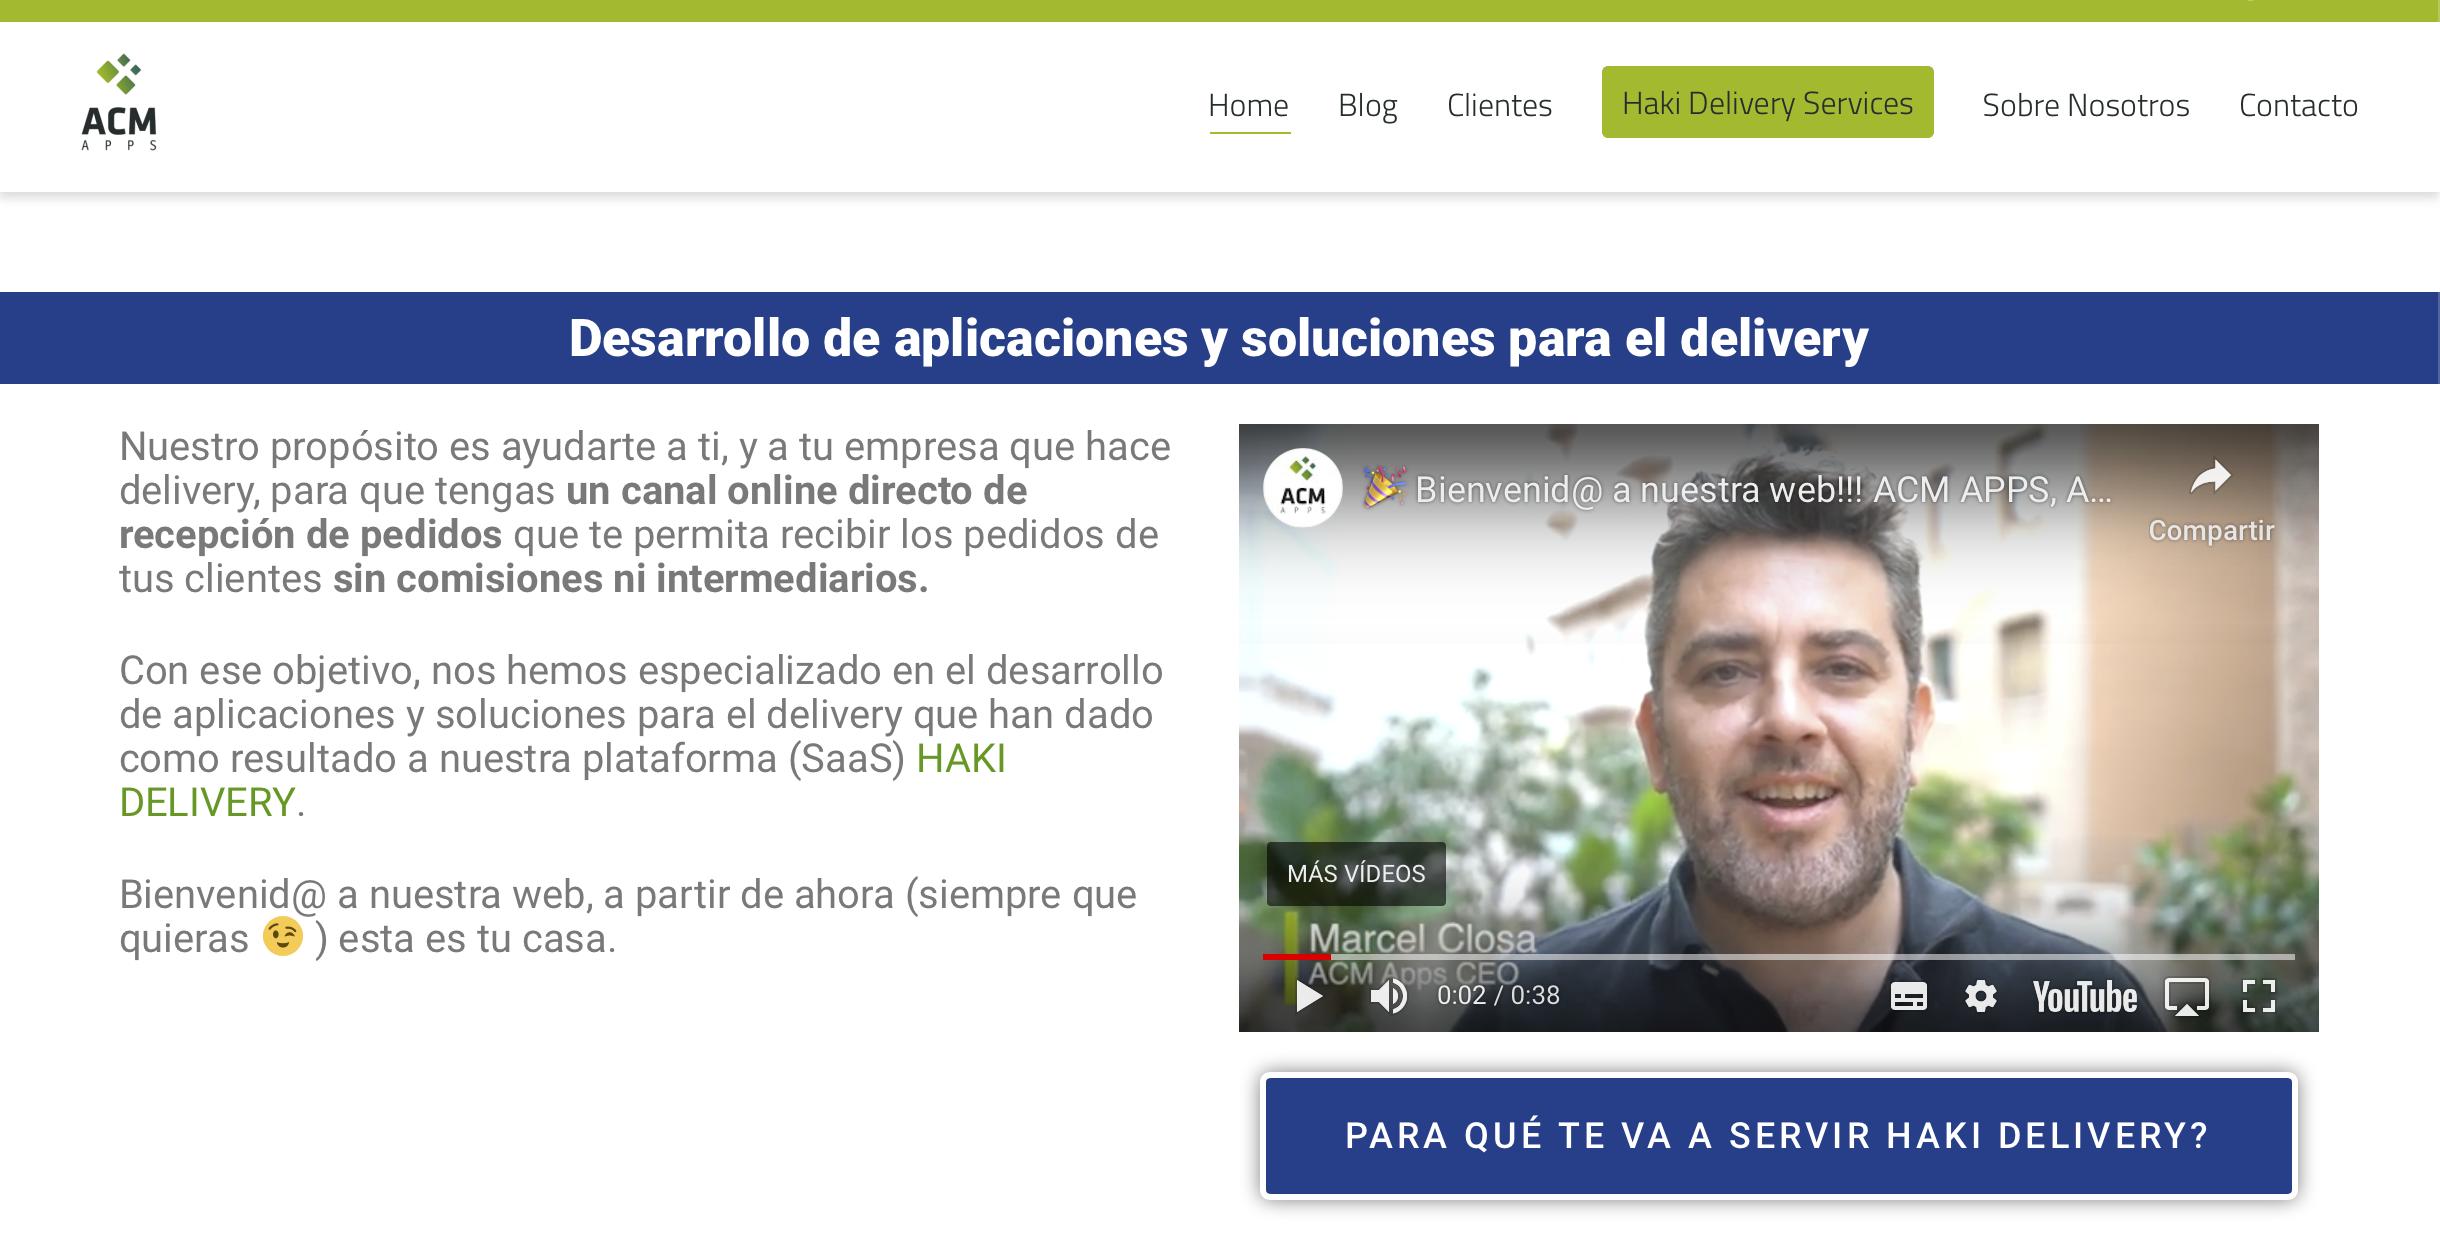 Bàrbara Izquierdo + ACM Apps